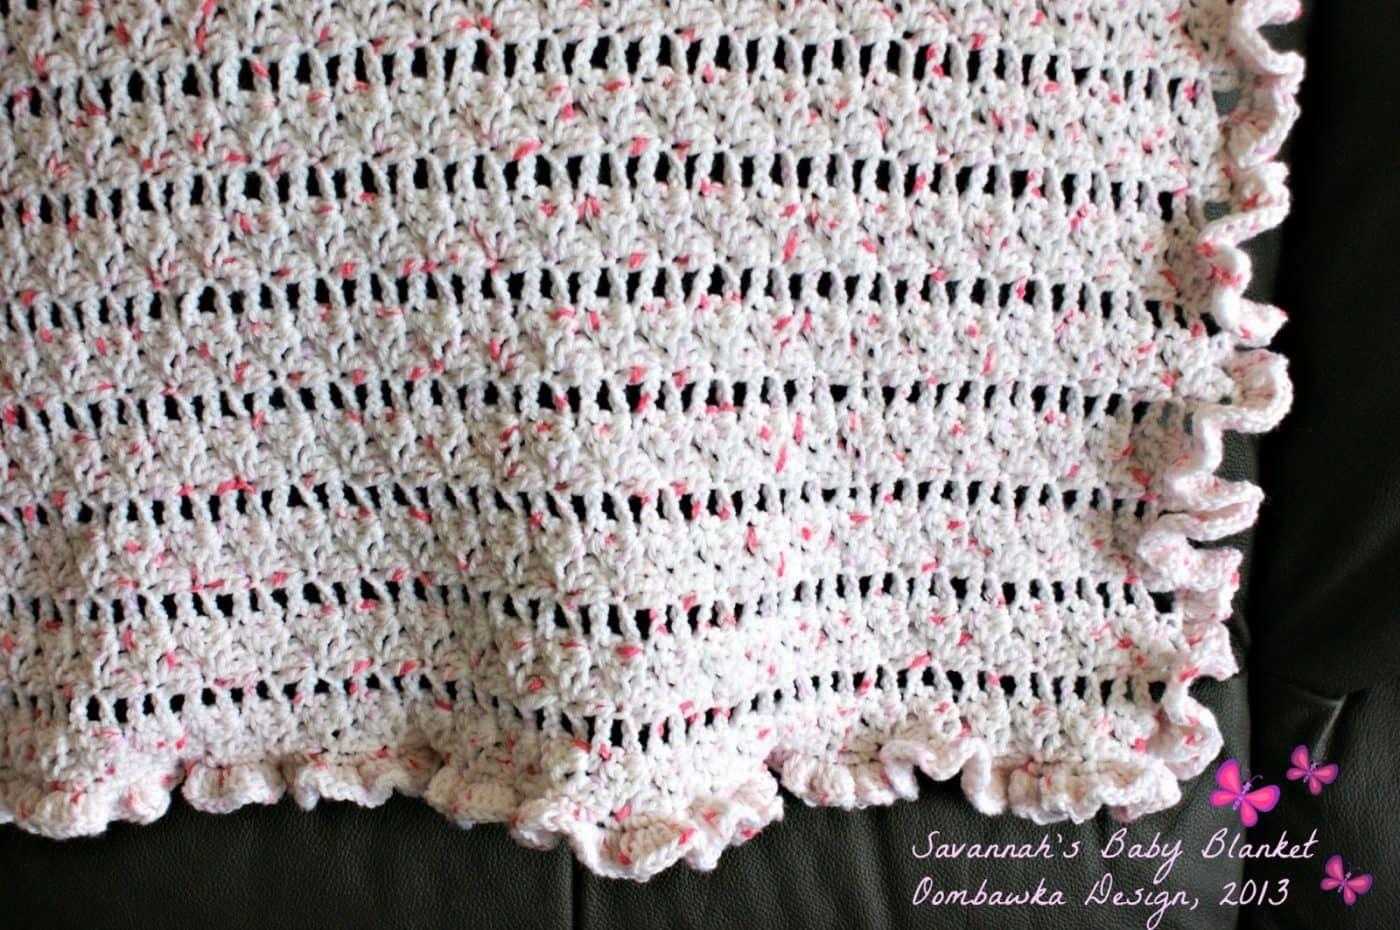 Savannah S Baby Blanket Pattern Oombawka Design Crochet